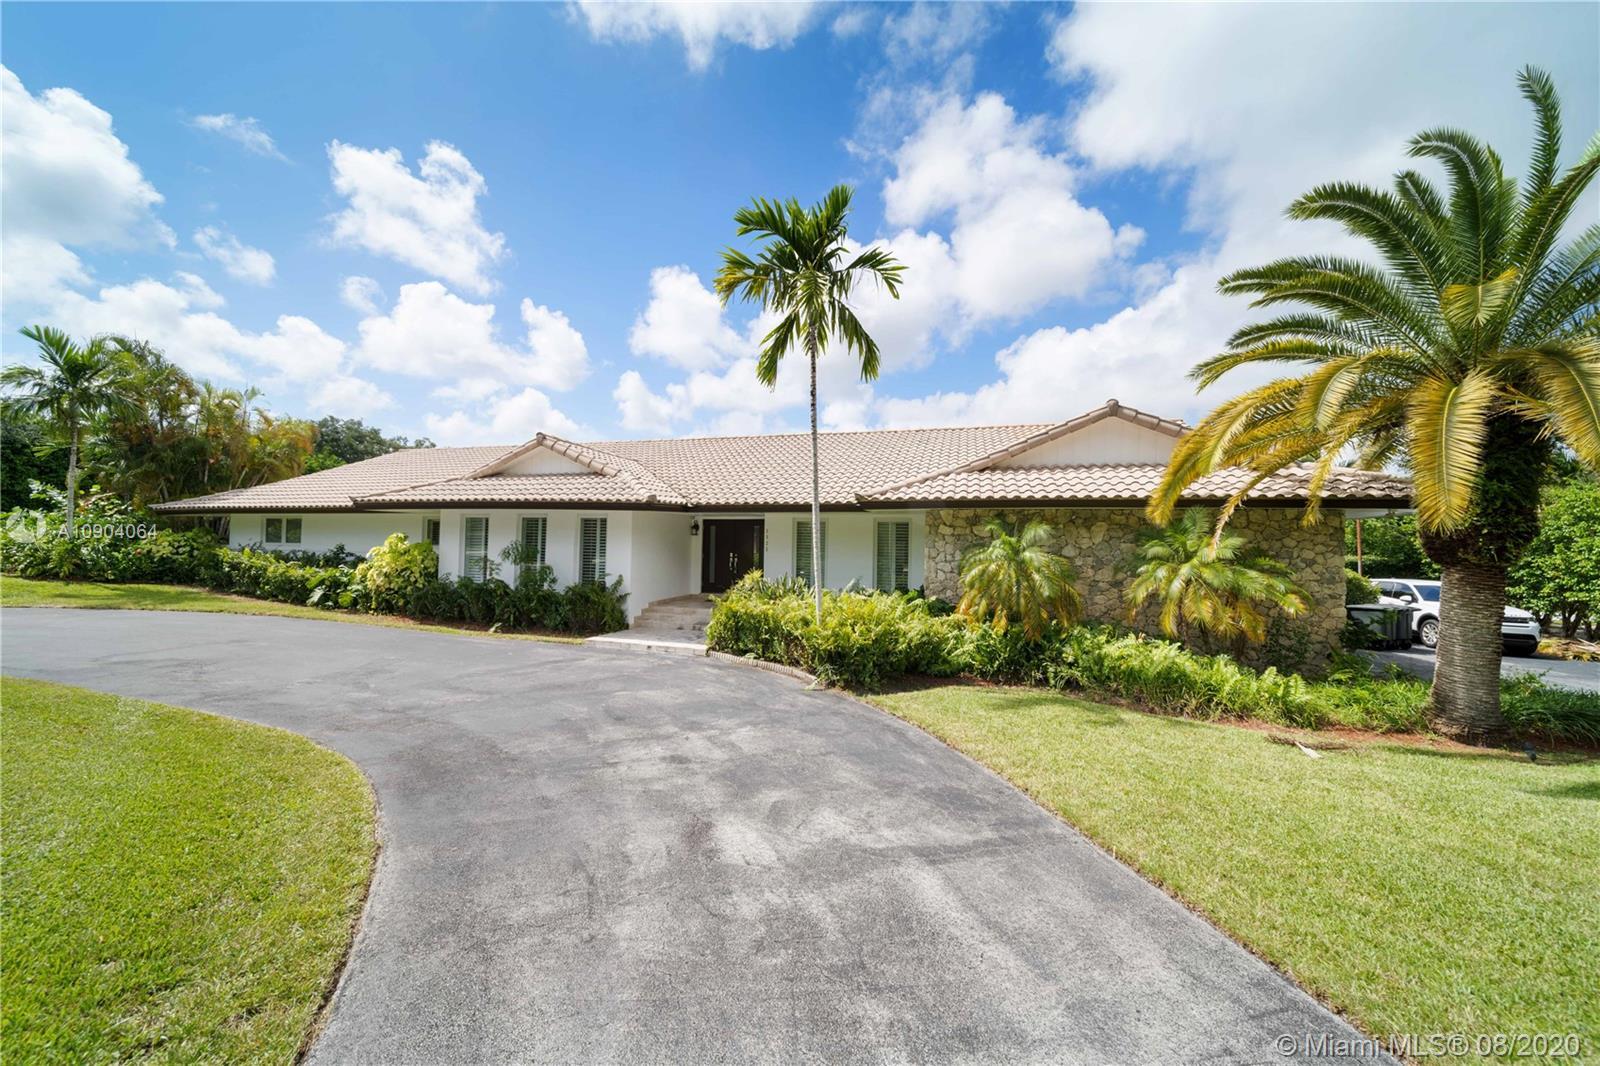 Pine Bay Estates - 5925 SW 117 ST, Coral Gables, FL 33156